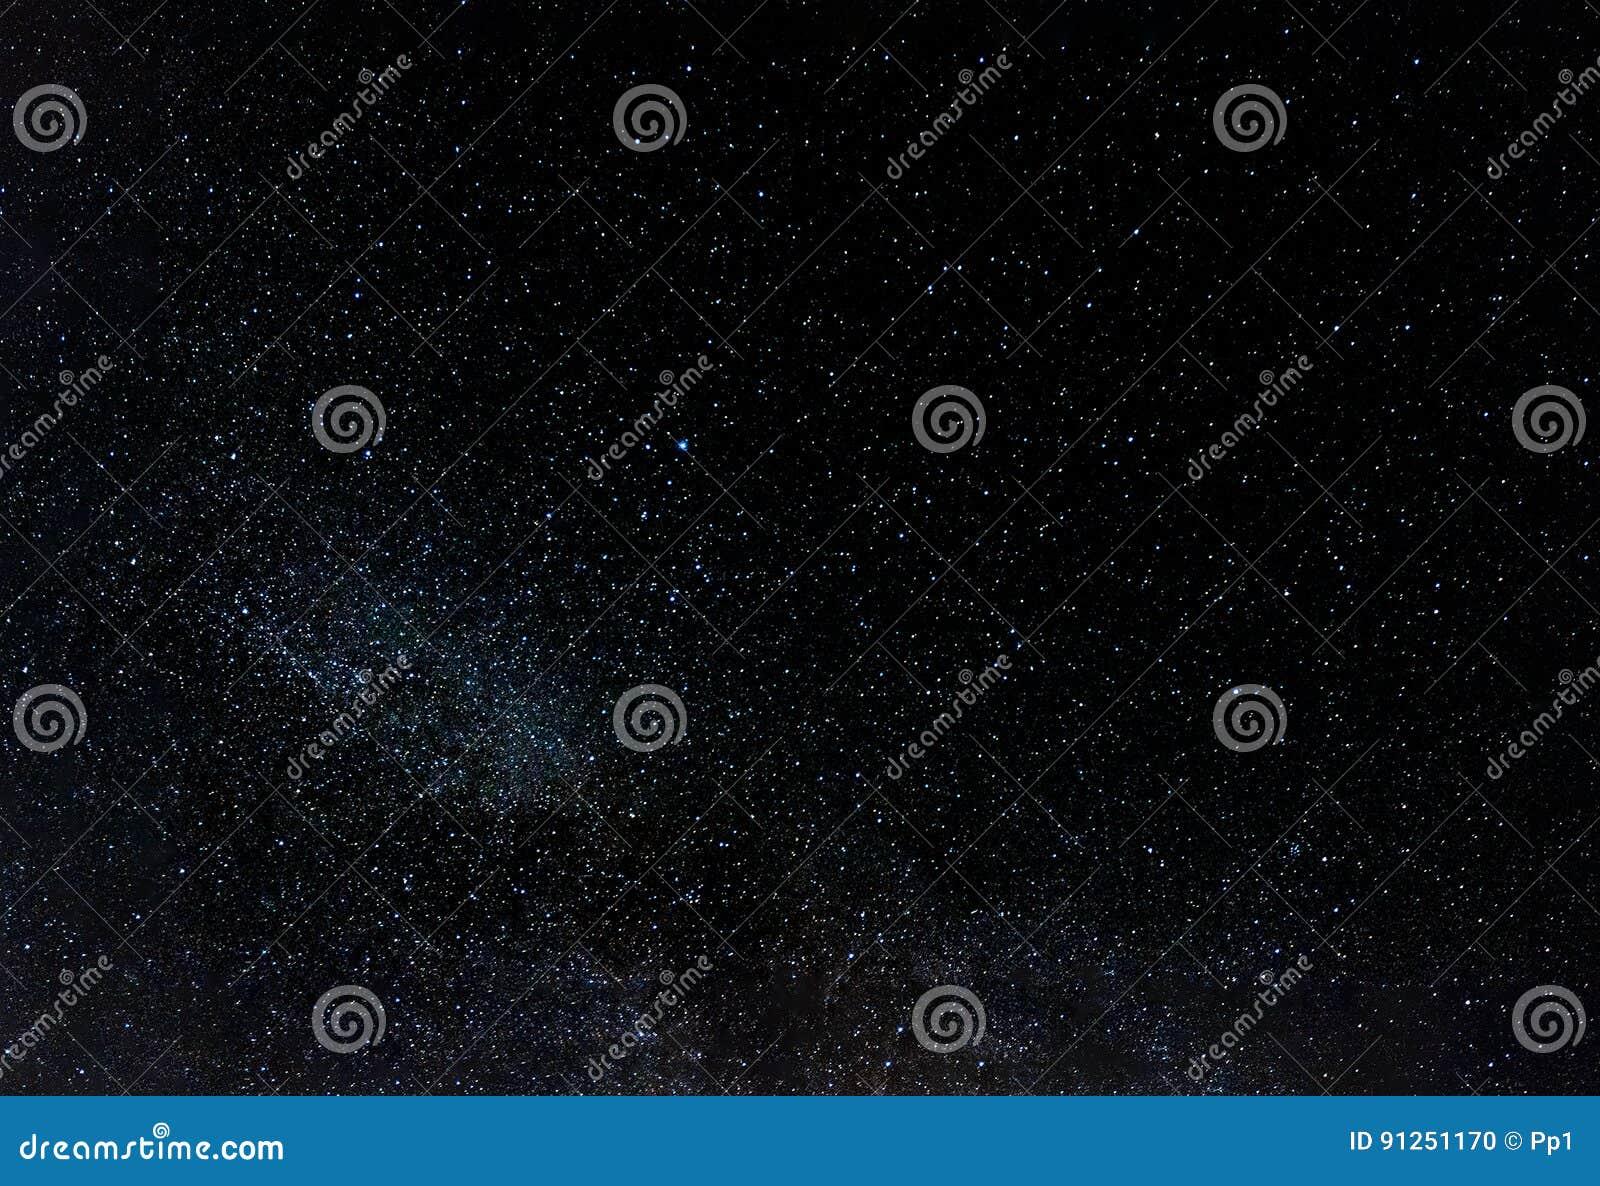 Night sky full of stars, southern hemisphere view